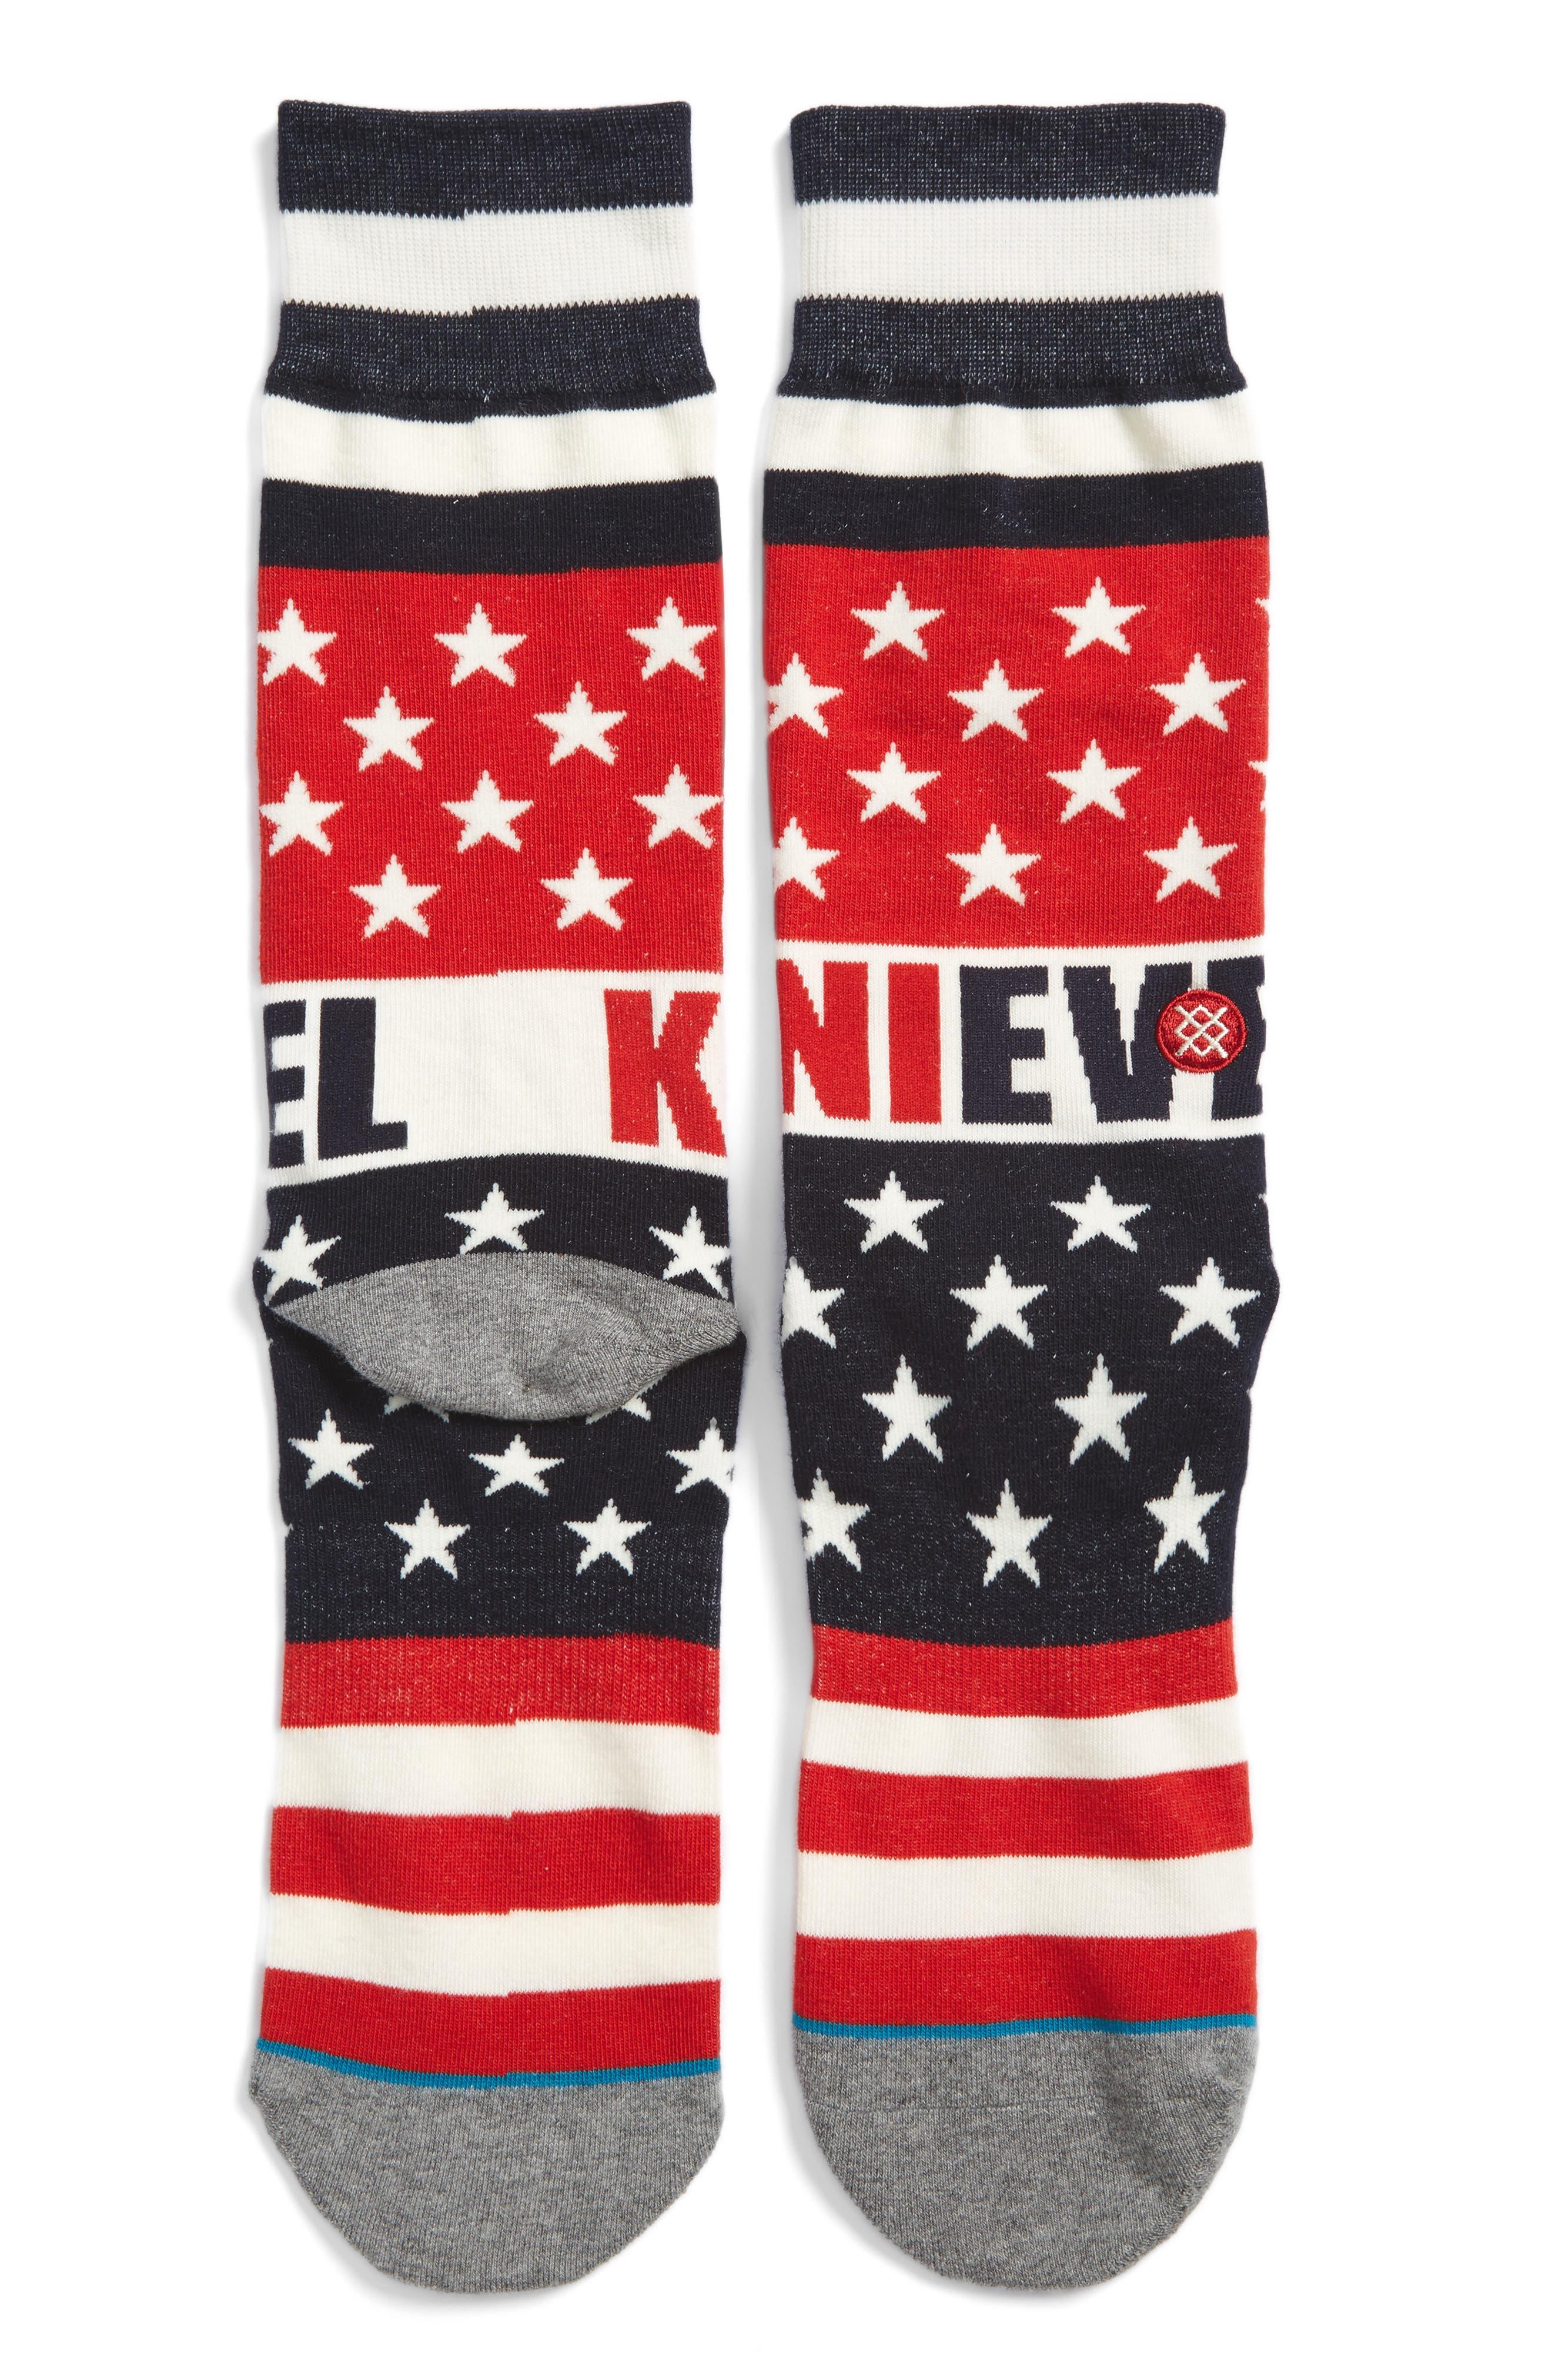 Evel Knievel x Stance Gladiator Socks,                         Main,                         color, 610